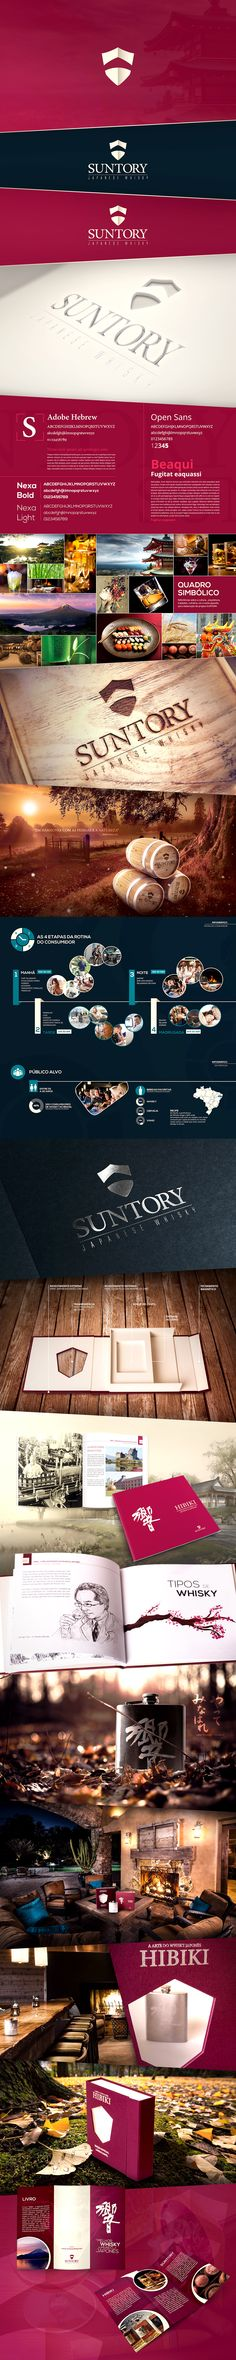 SUNTORY WHISKY | Branding | Confira meu projeto do @Behance: